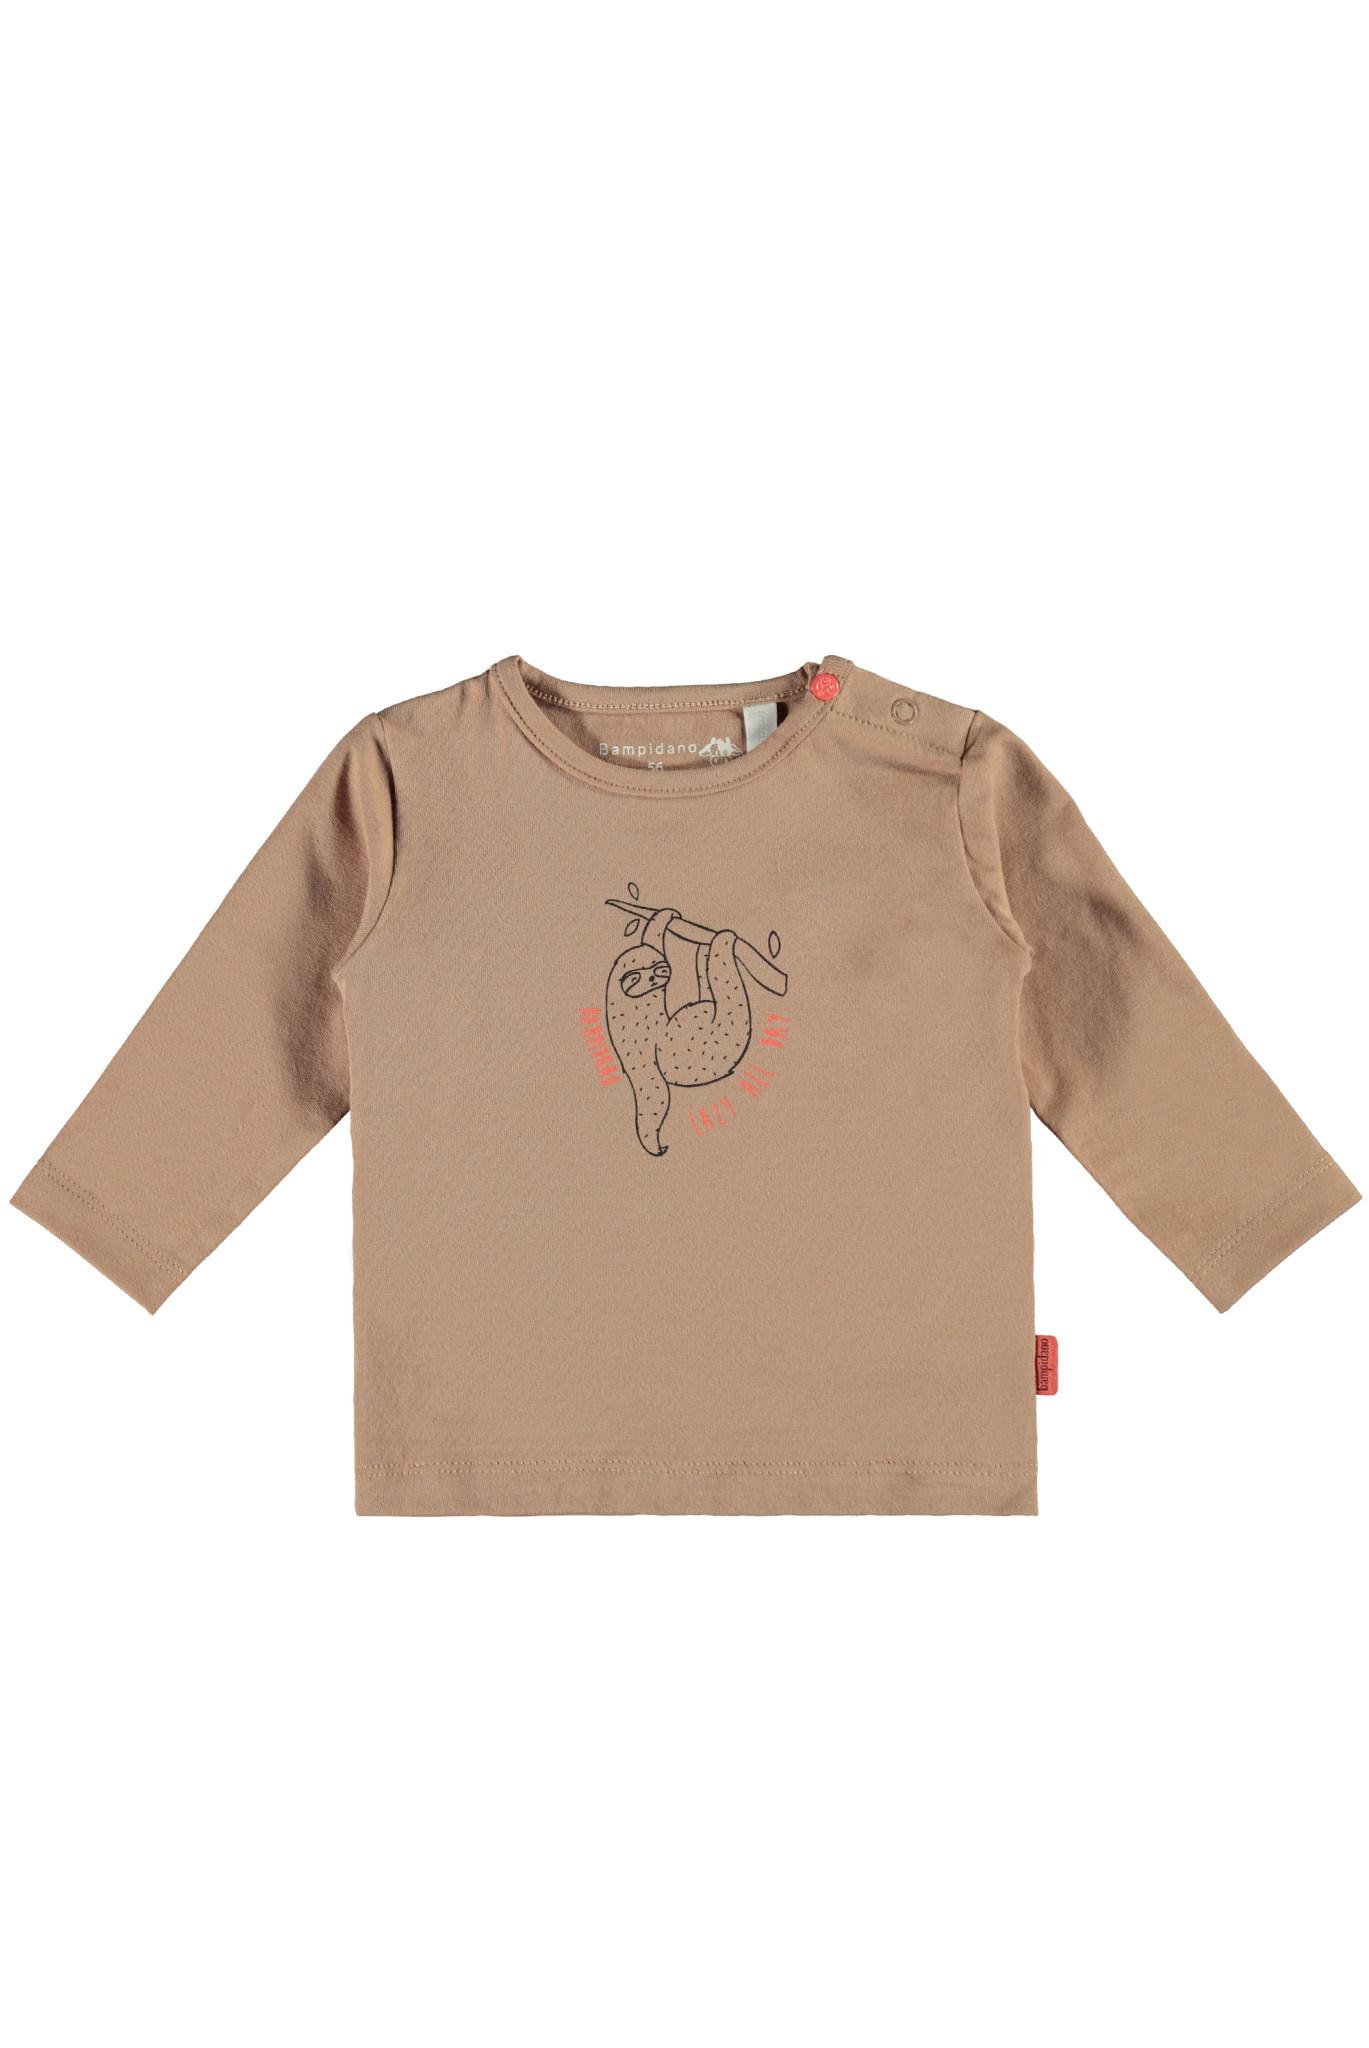 Fynn Shirt